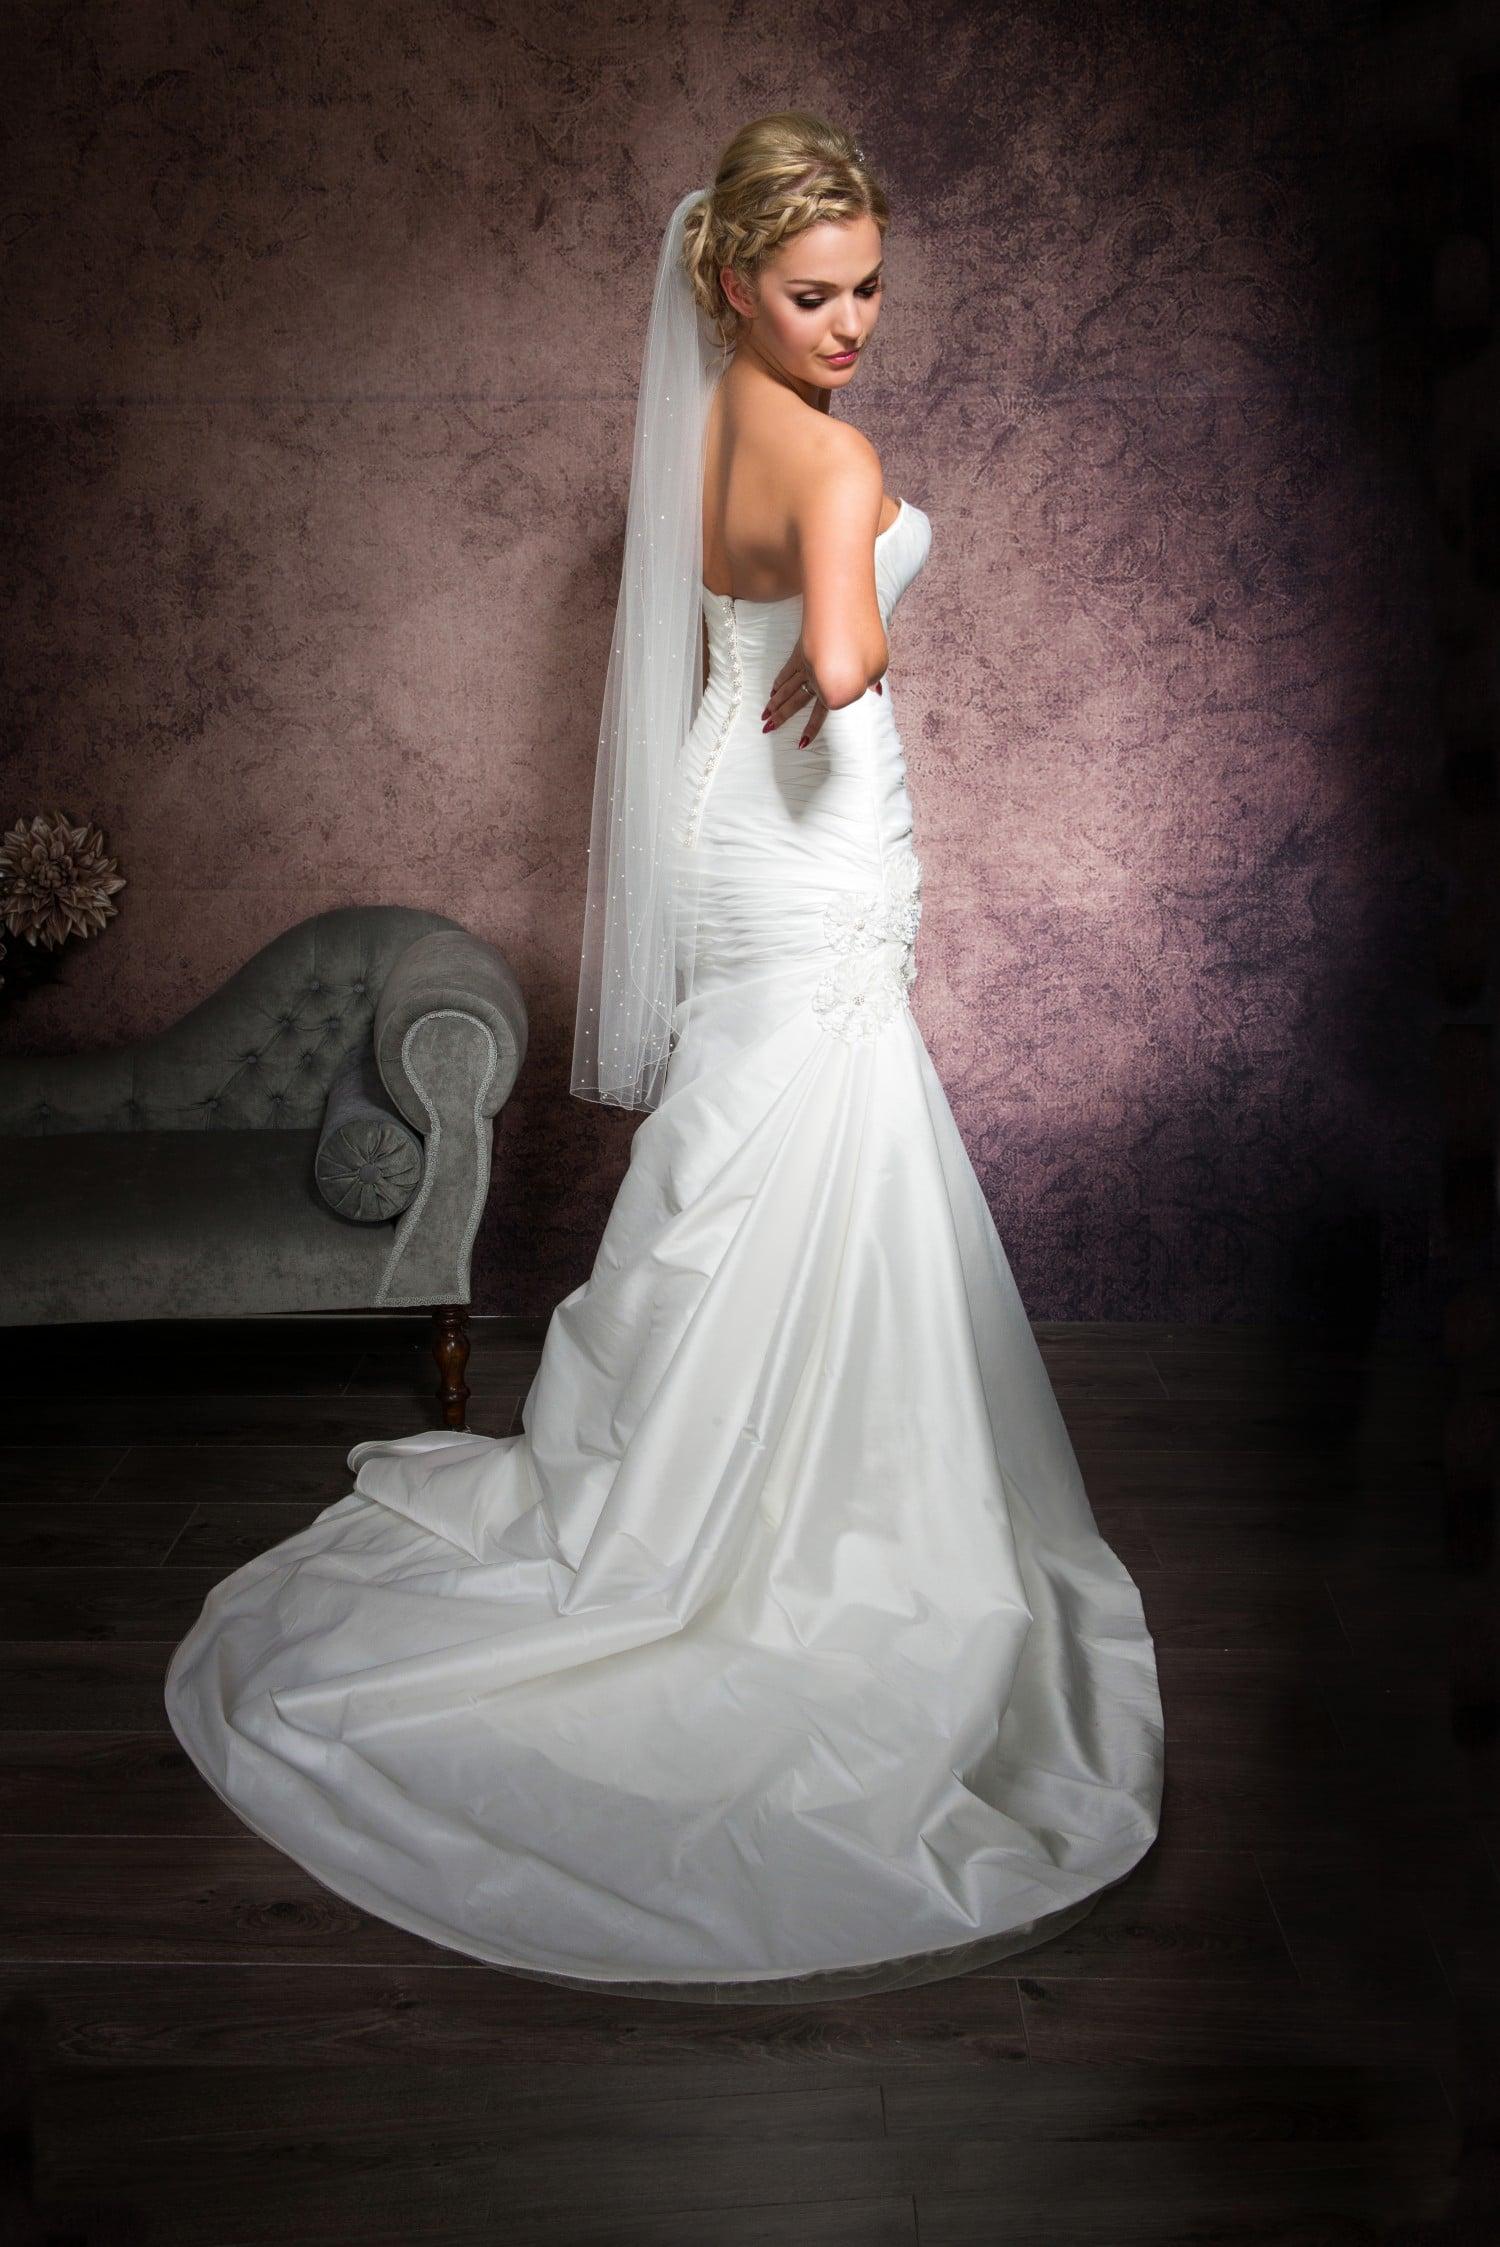 Bride looking over shoulder wearing a one layer fingertip length veil